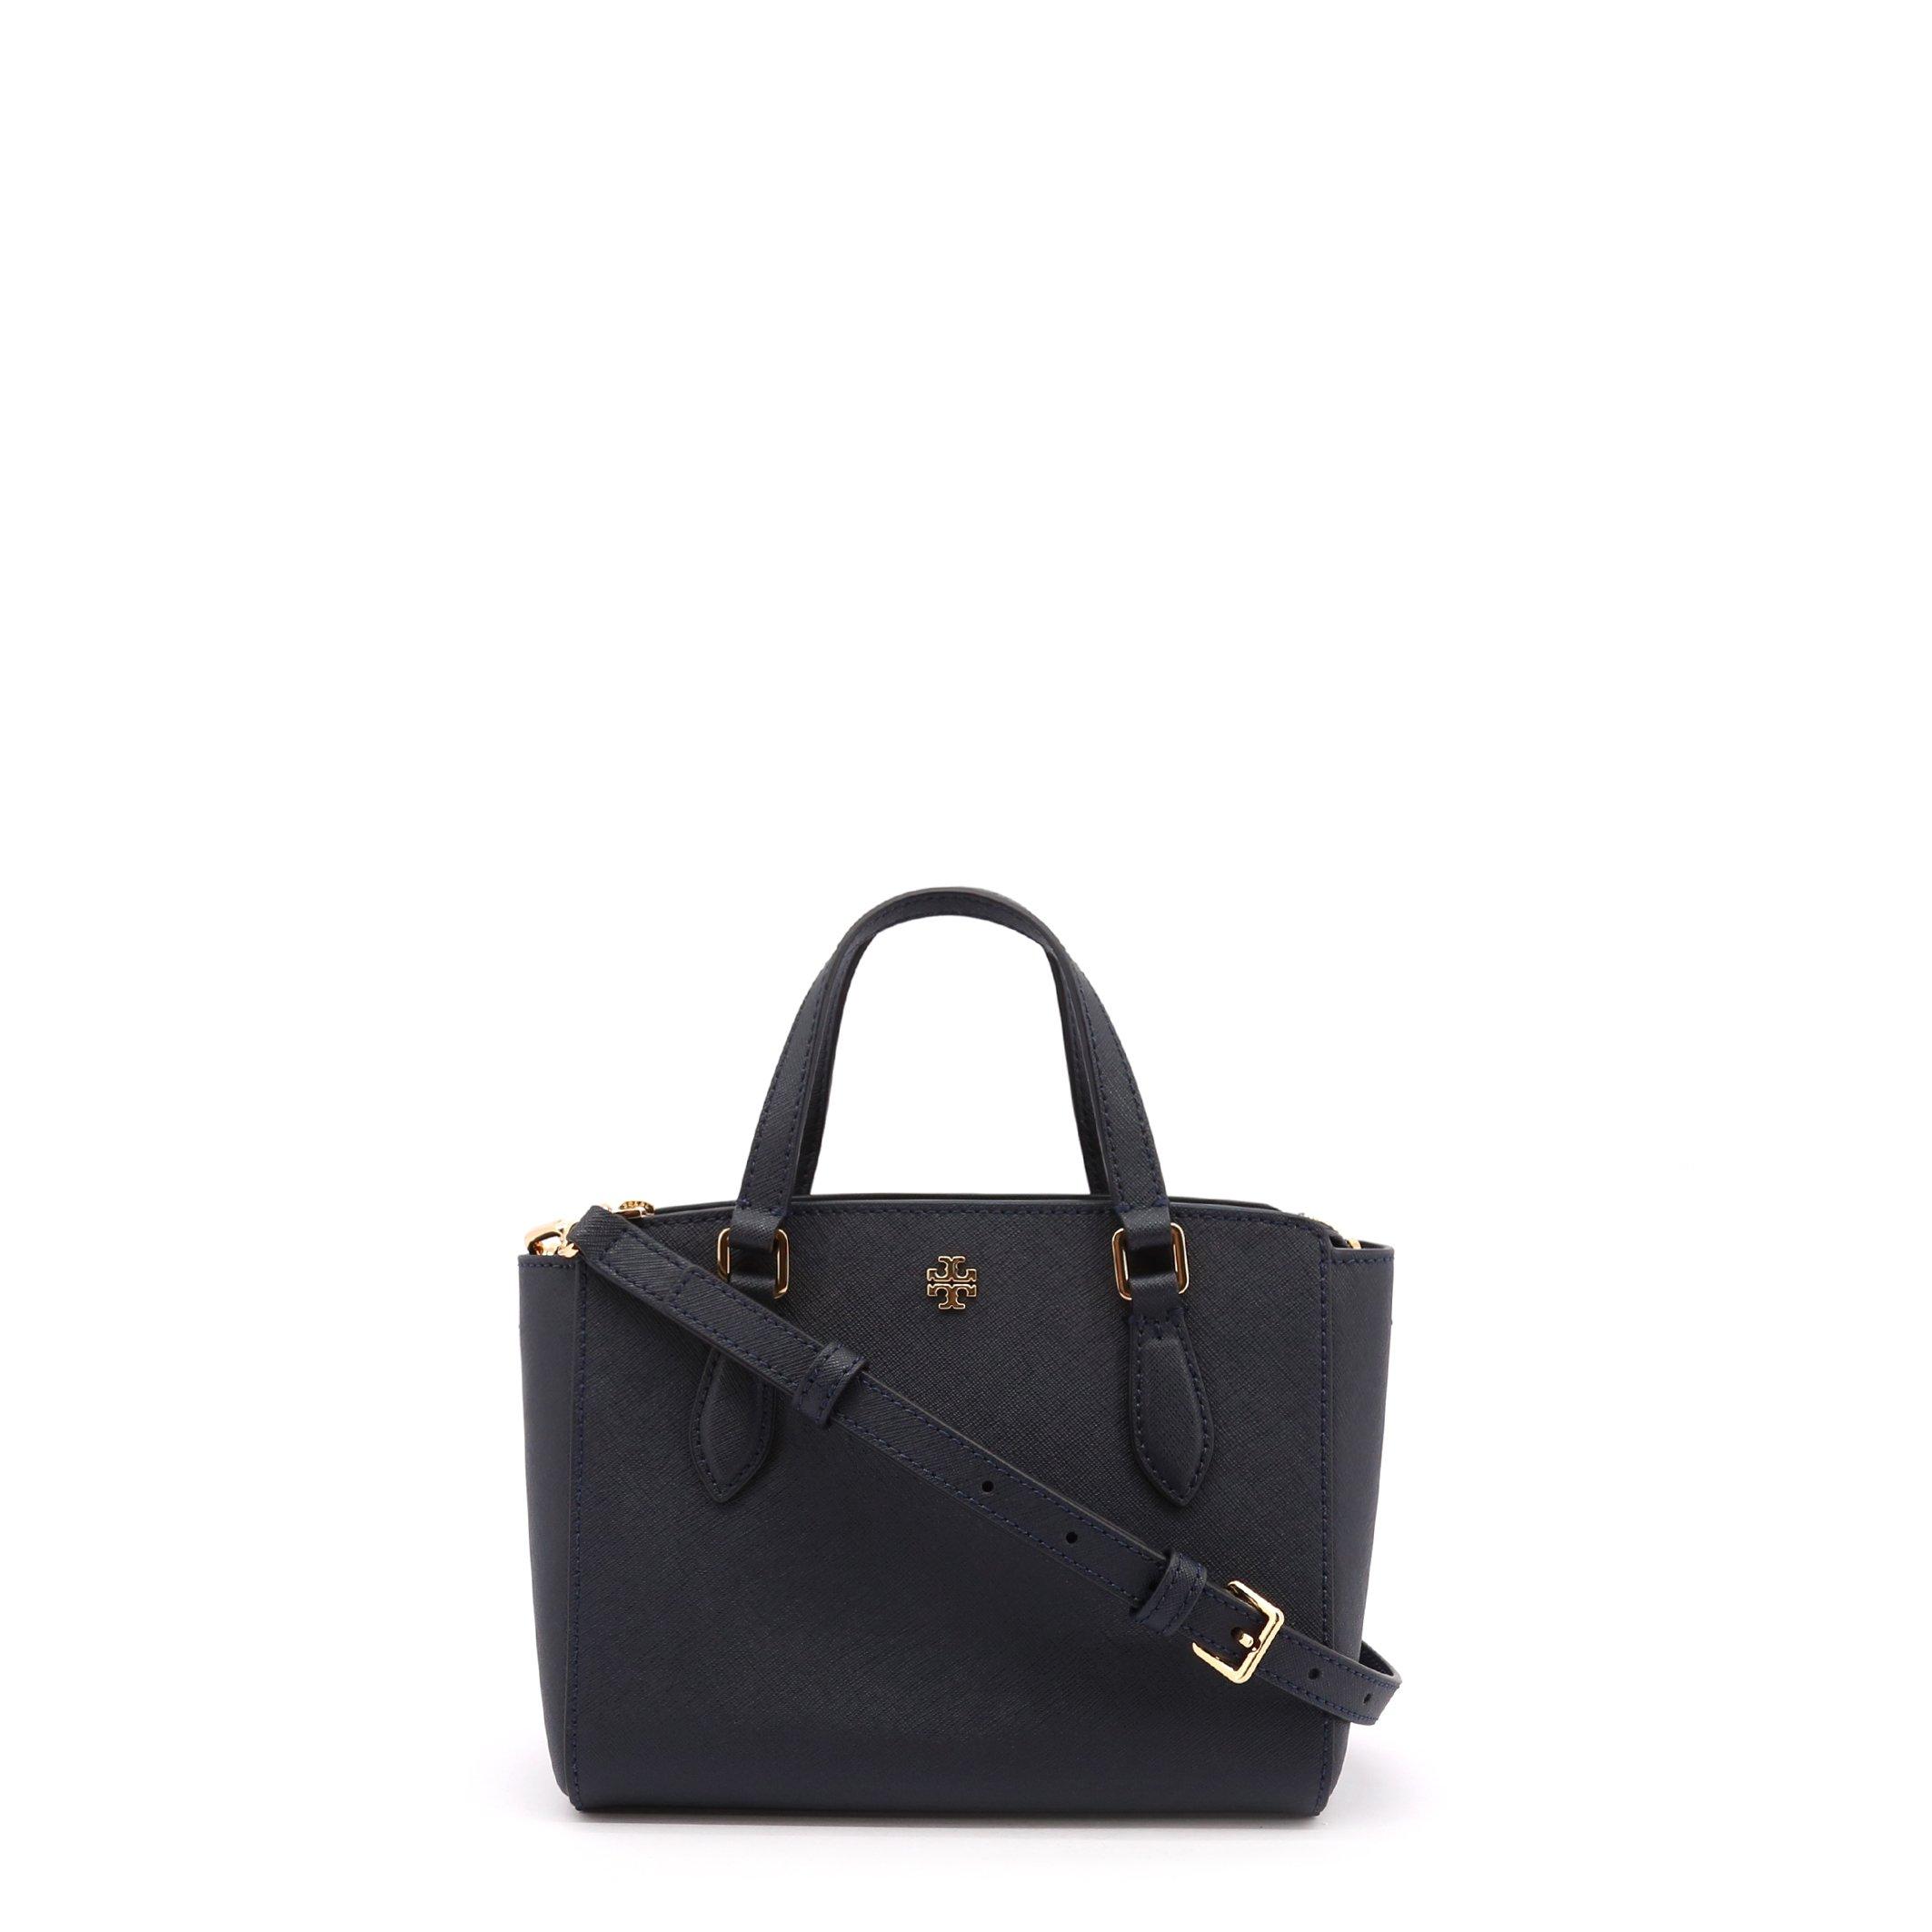 Tory Burch Women's Handbag Various Colours 64189 - blue-1 NOSIZE